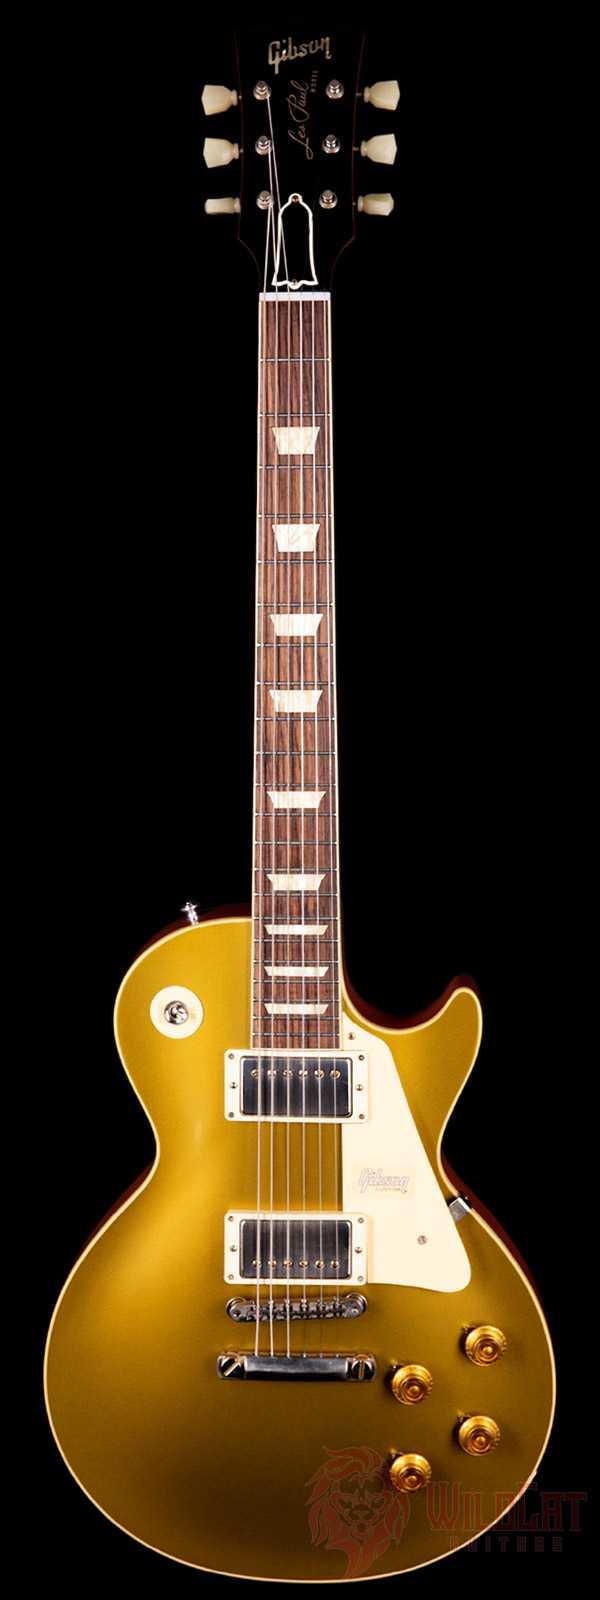 Gibson Custom Shop 1957 Les Paul Goldtop Reissue VOS Double Gold Light Back